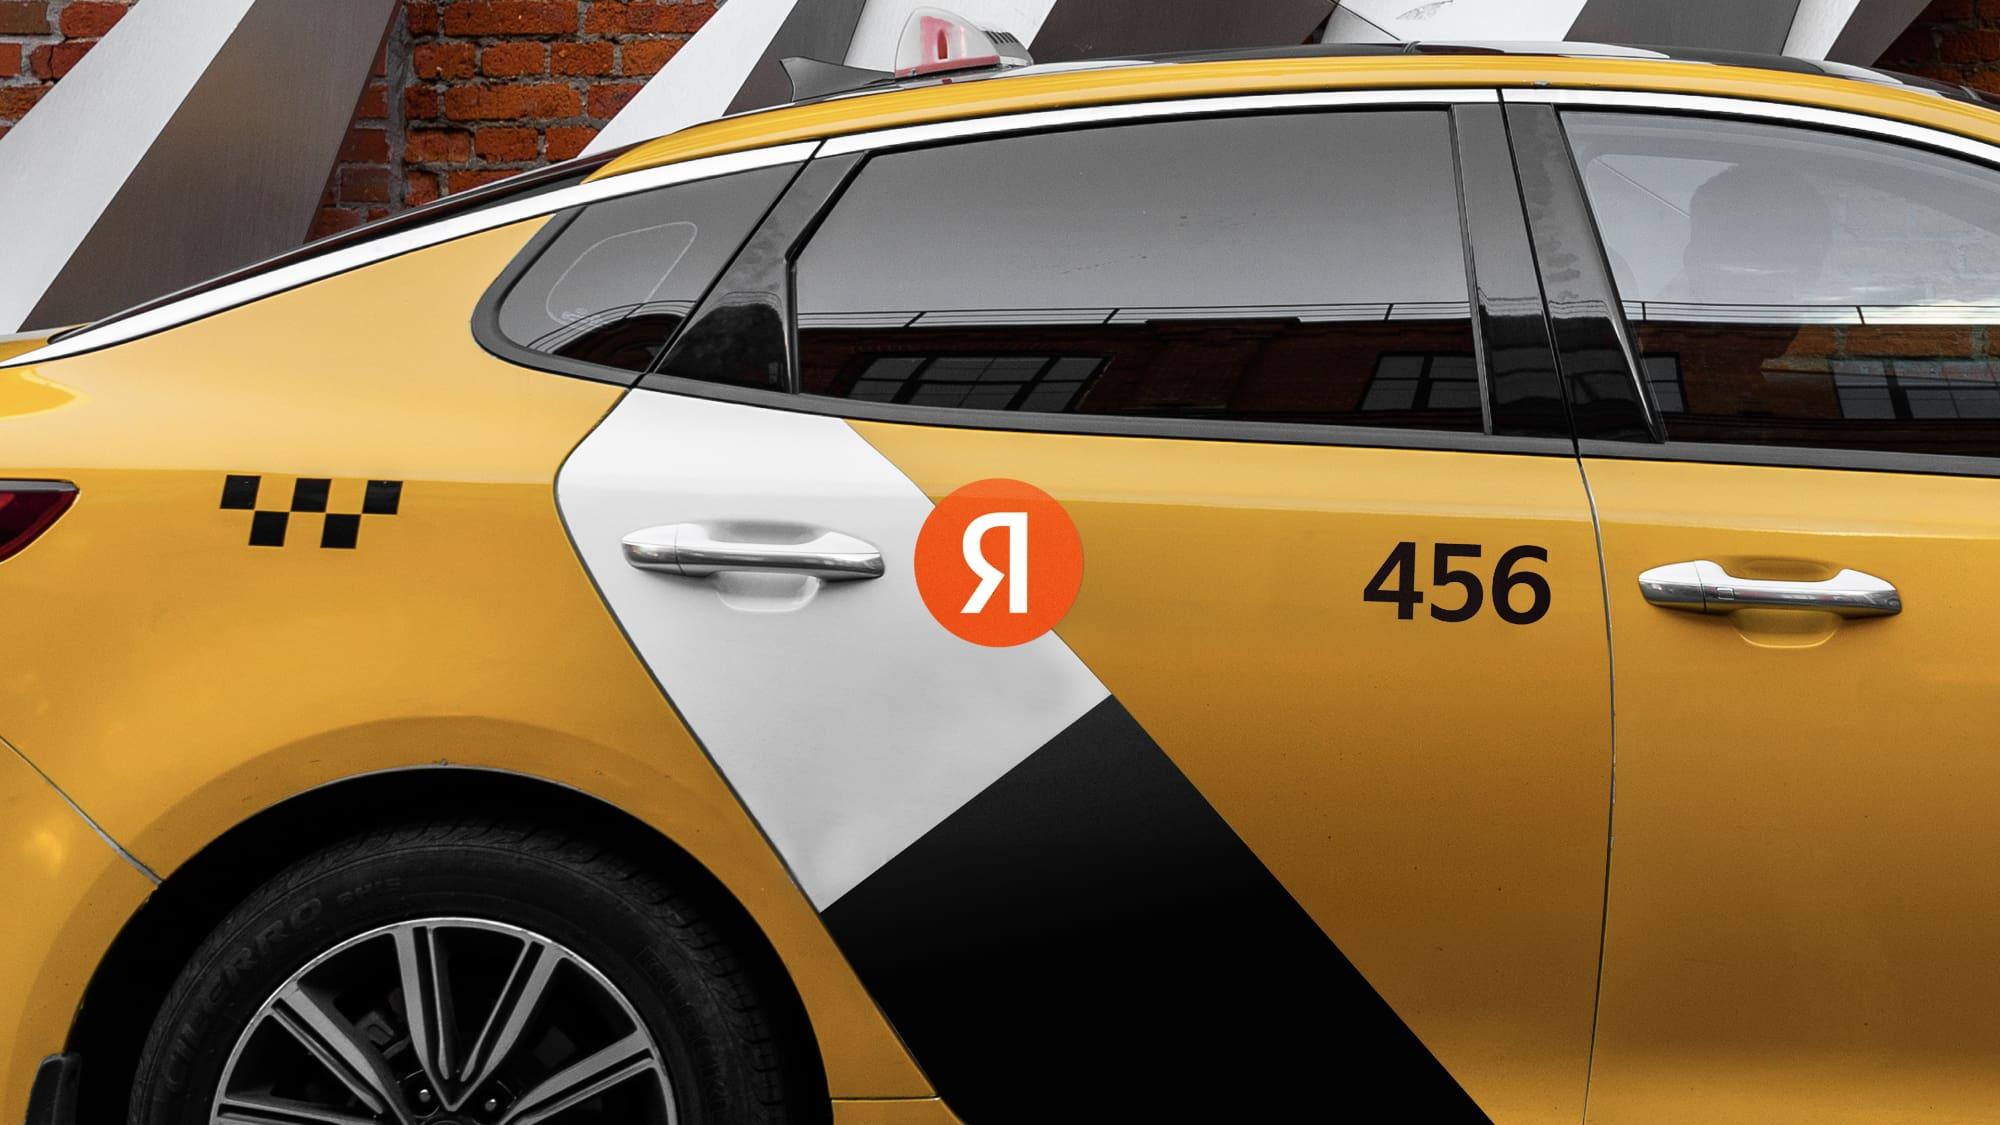 Яндекс представил новый логотип